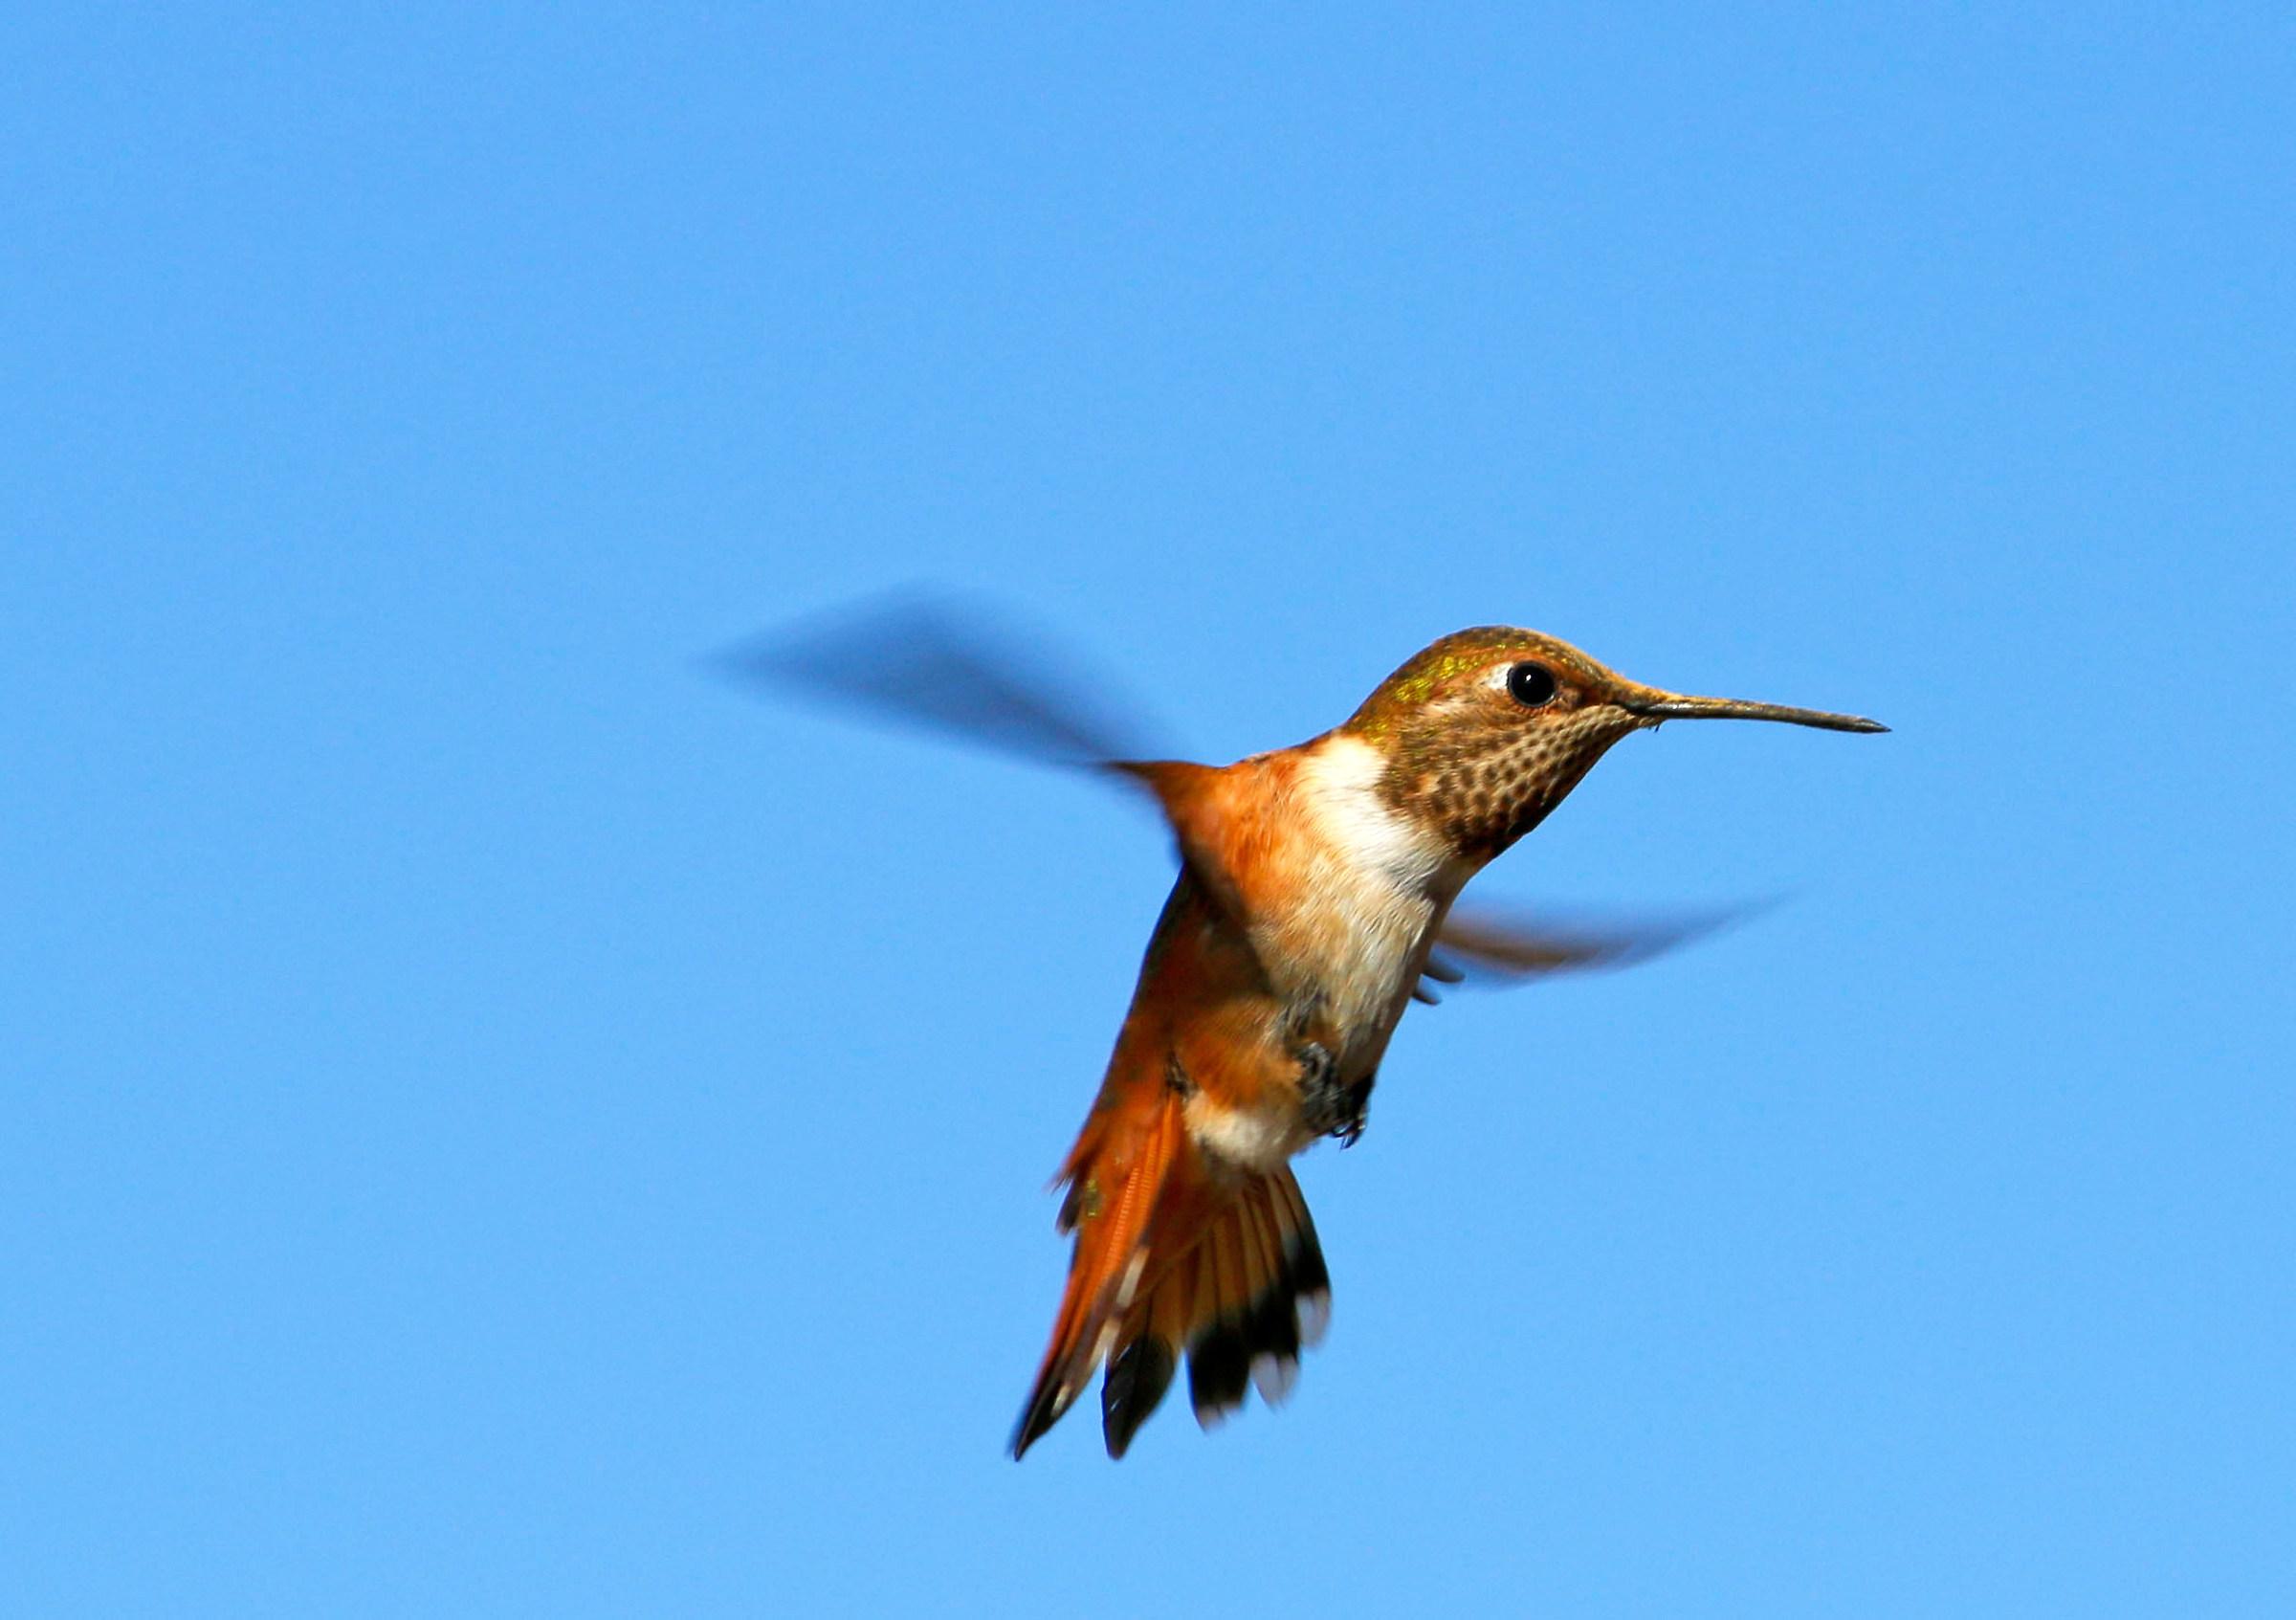 My first hummingbird...